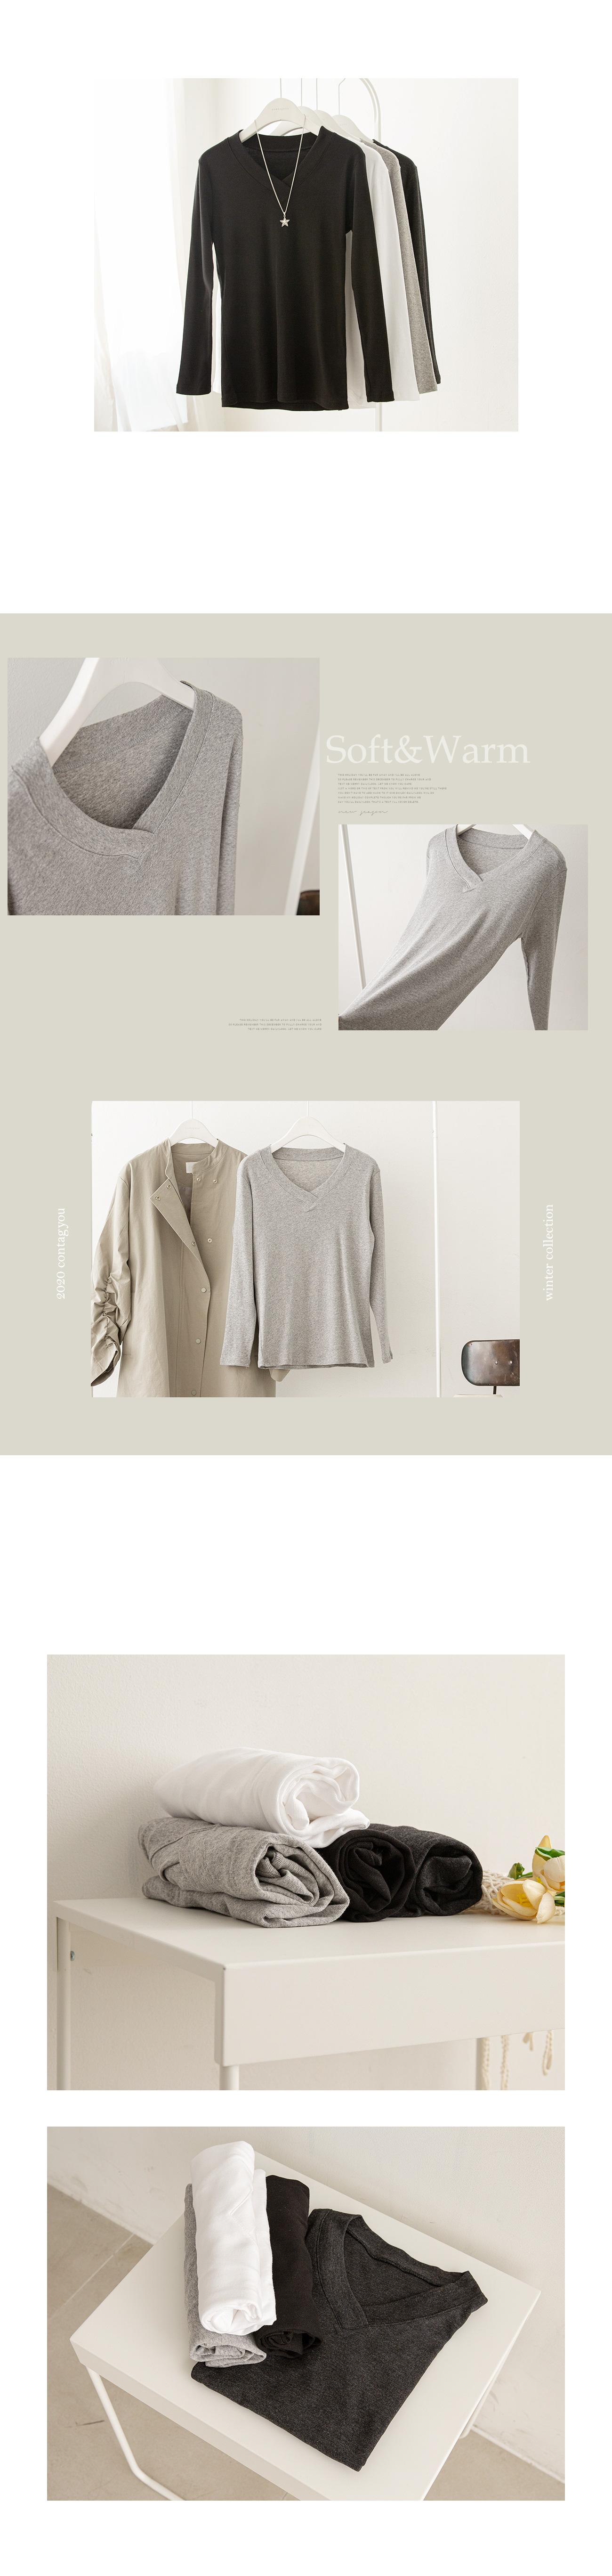 Clean Simple V Neck T-Shirt #19663